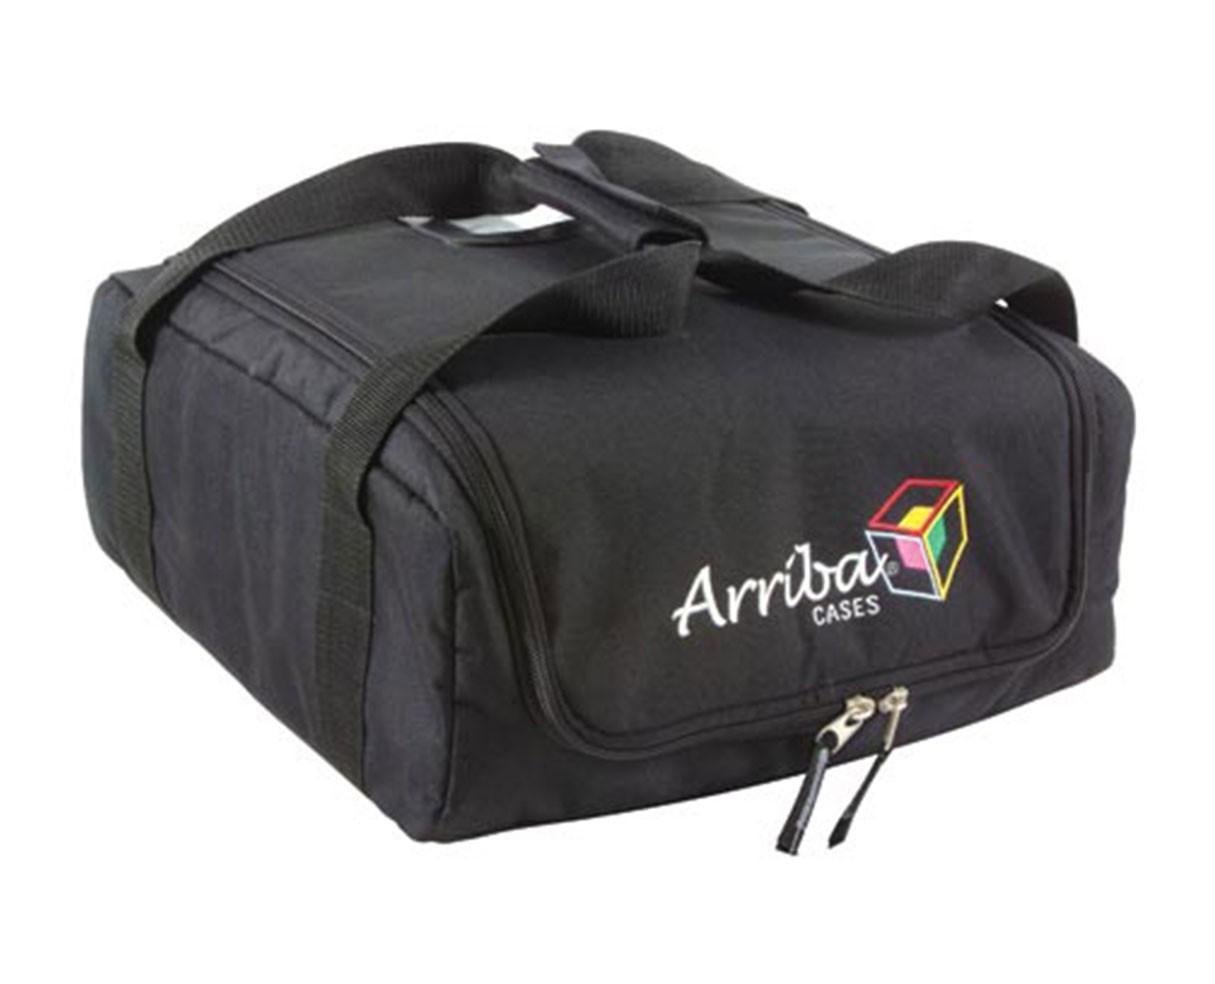 Arriba AC100 Padded Light Bag